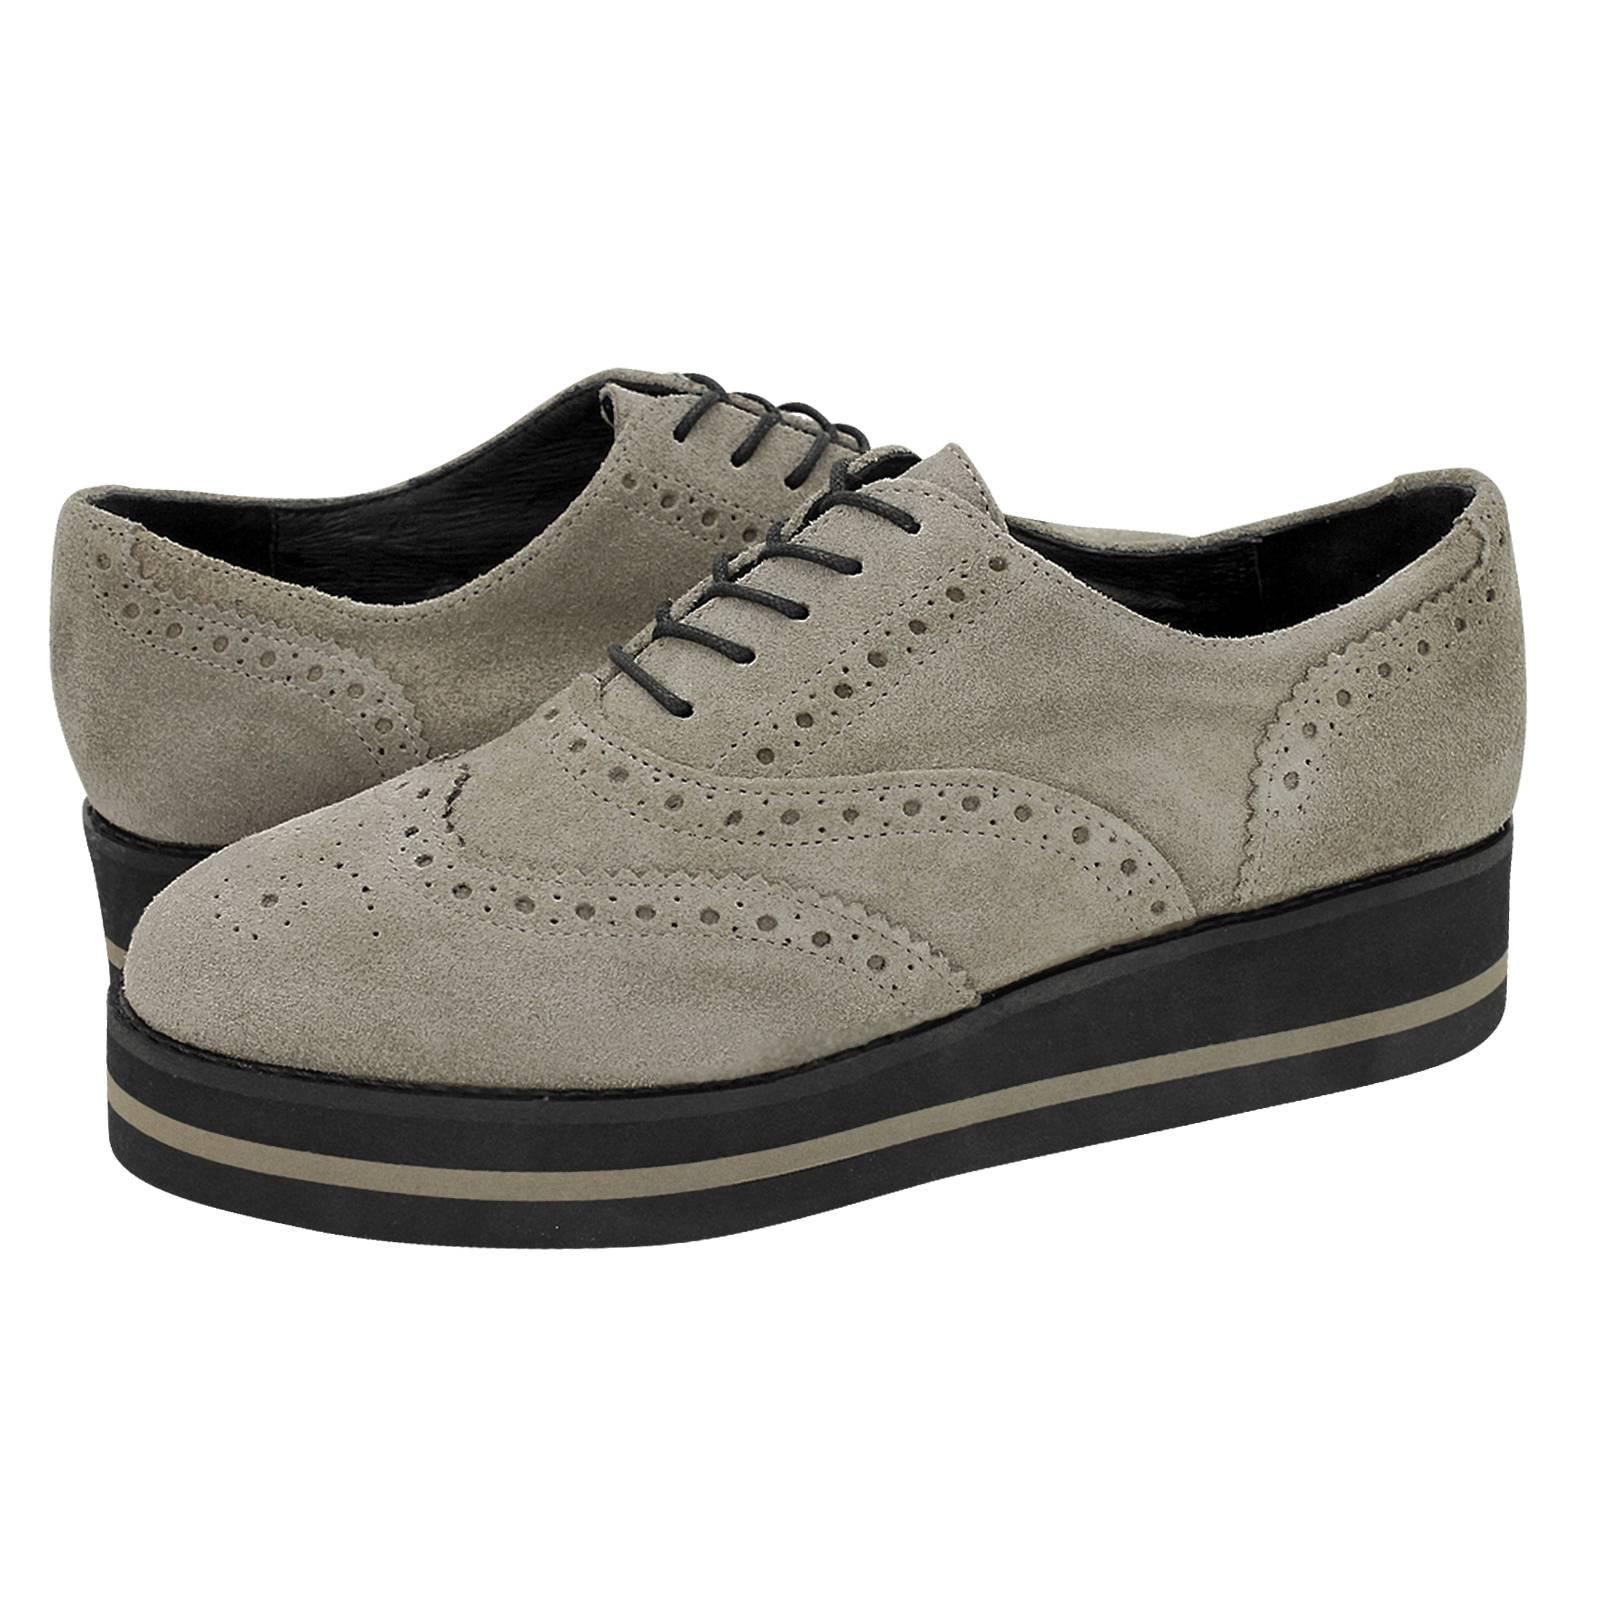 Candos - Esthissis Women s Oxford shoes made of suede - Gianna ... c9a475136e2